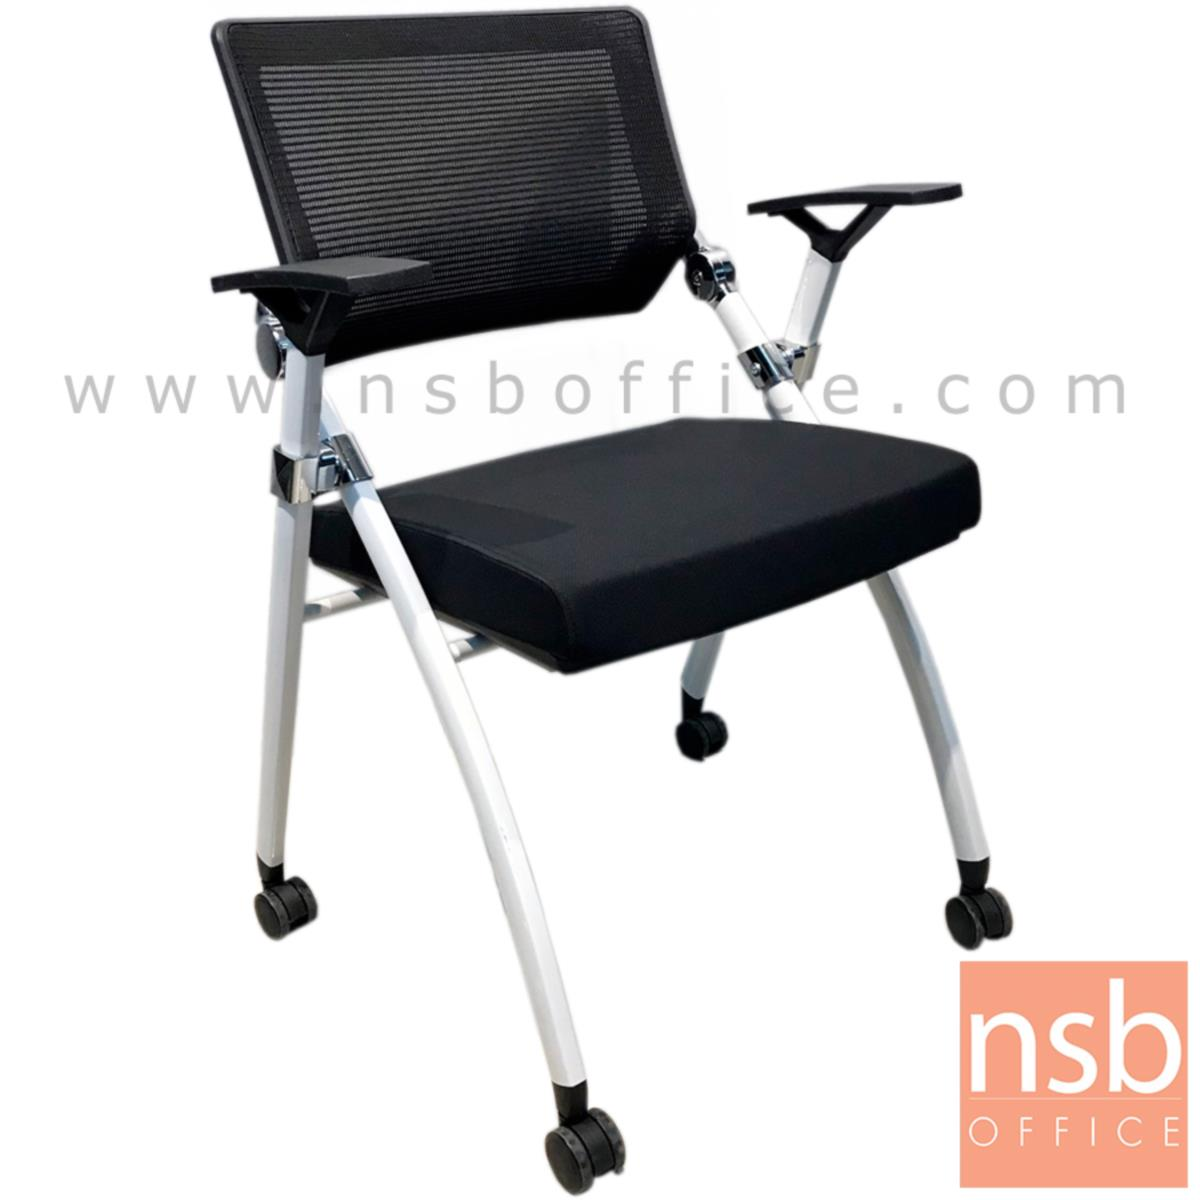 B24A237:เก้าอี้สำนักงานหลังเน็ต รุ่น Houdini (ฮูดินี)  ขาเหล็กพ่นสีขาว